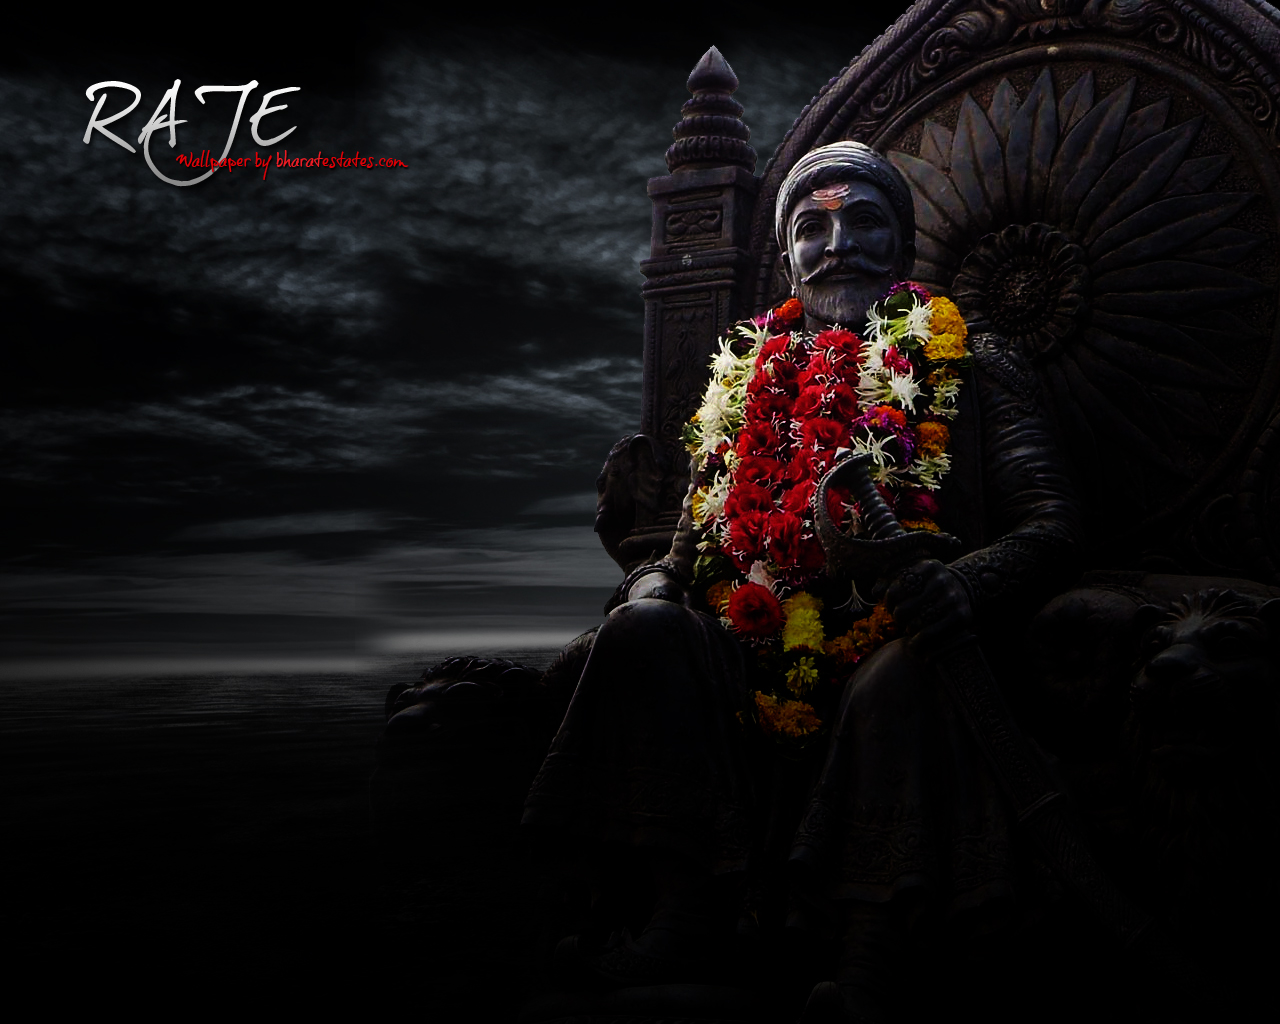 Wallpaper: Shivaji Maharaj Hd Wallpapers Desktop Background